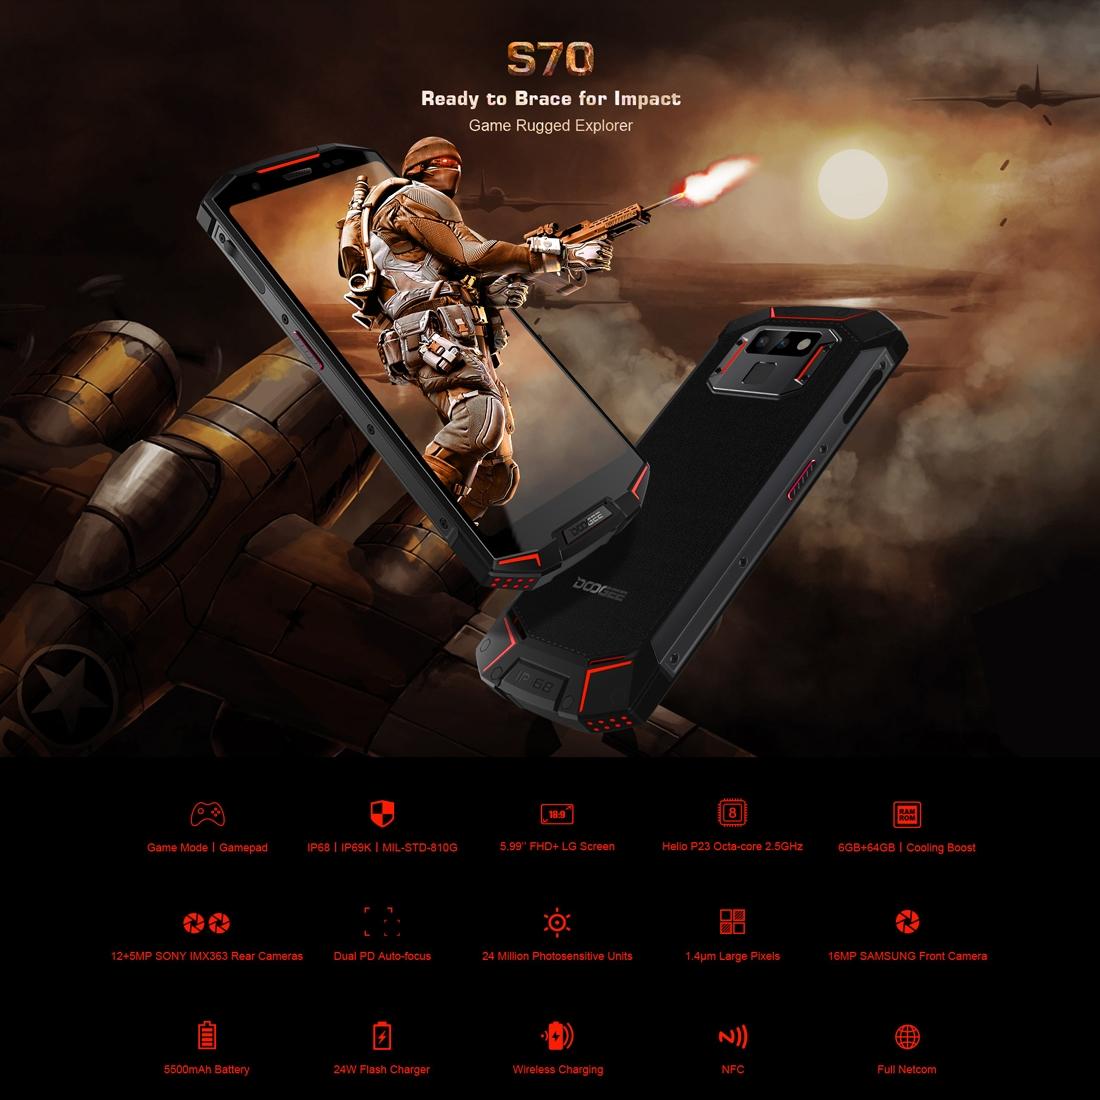 Проектор Смартфон DOOGEE S70 6GB+64GB Защита от влаги пыли ударов по стандарту IP68/IP69K MIL-STD-810G 5500мАч батарея Двойная камера (Фото 3)